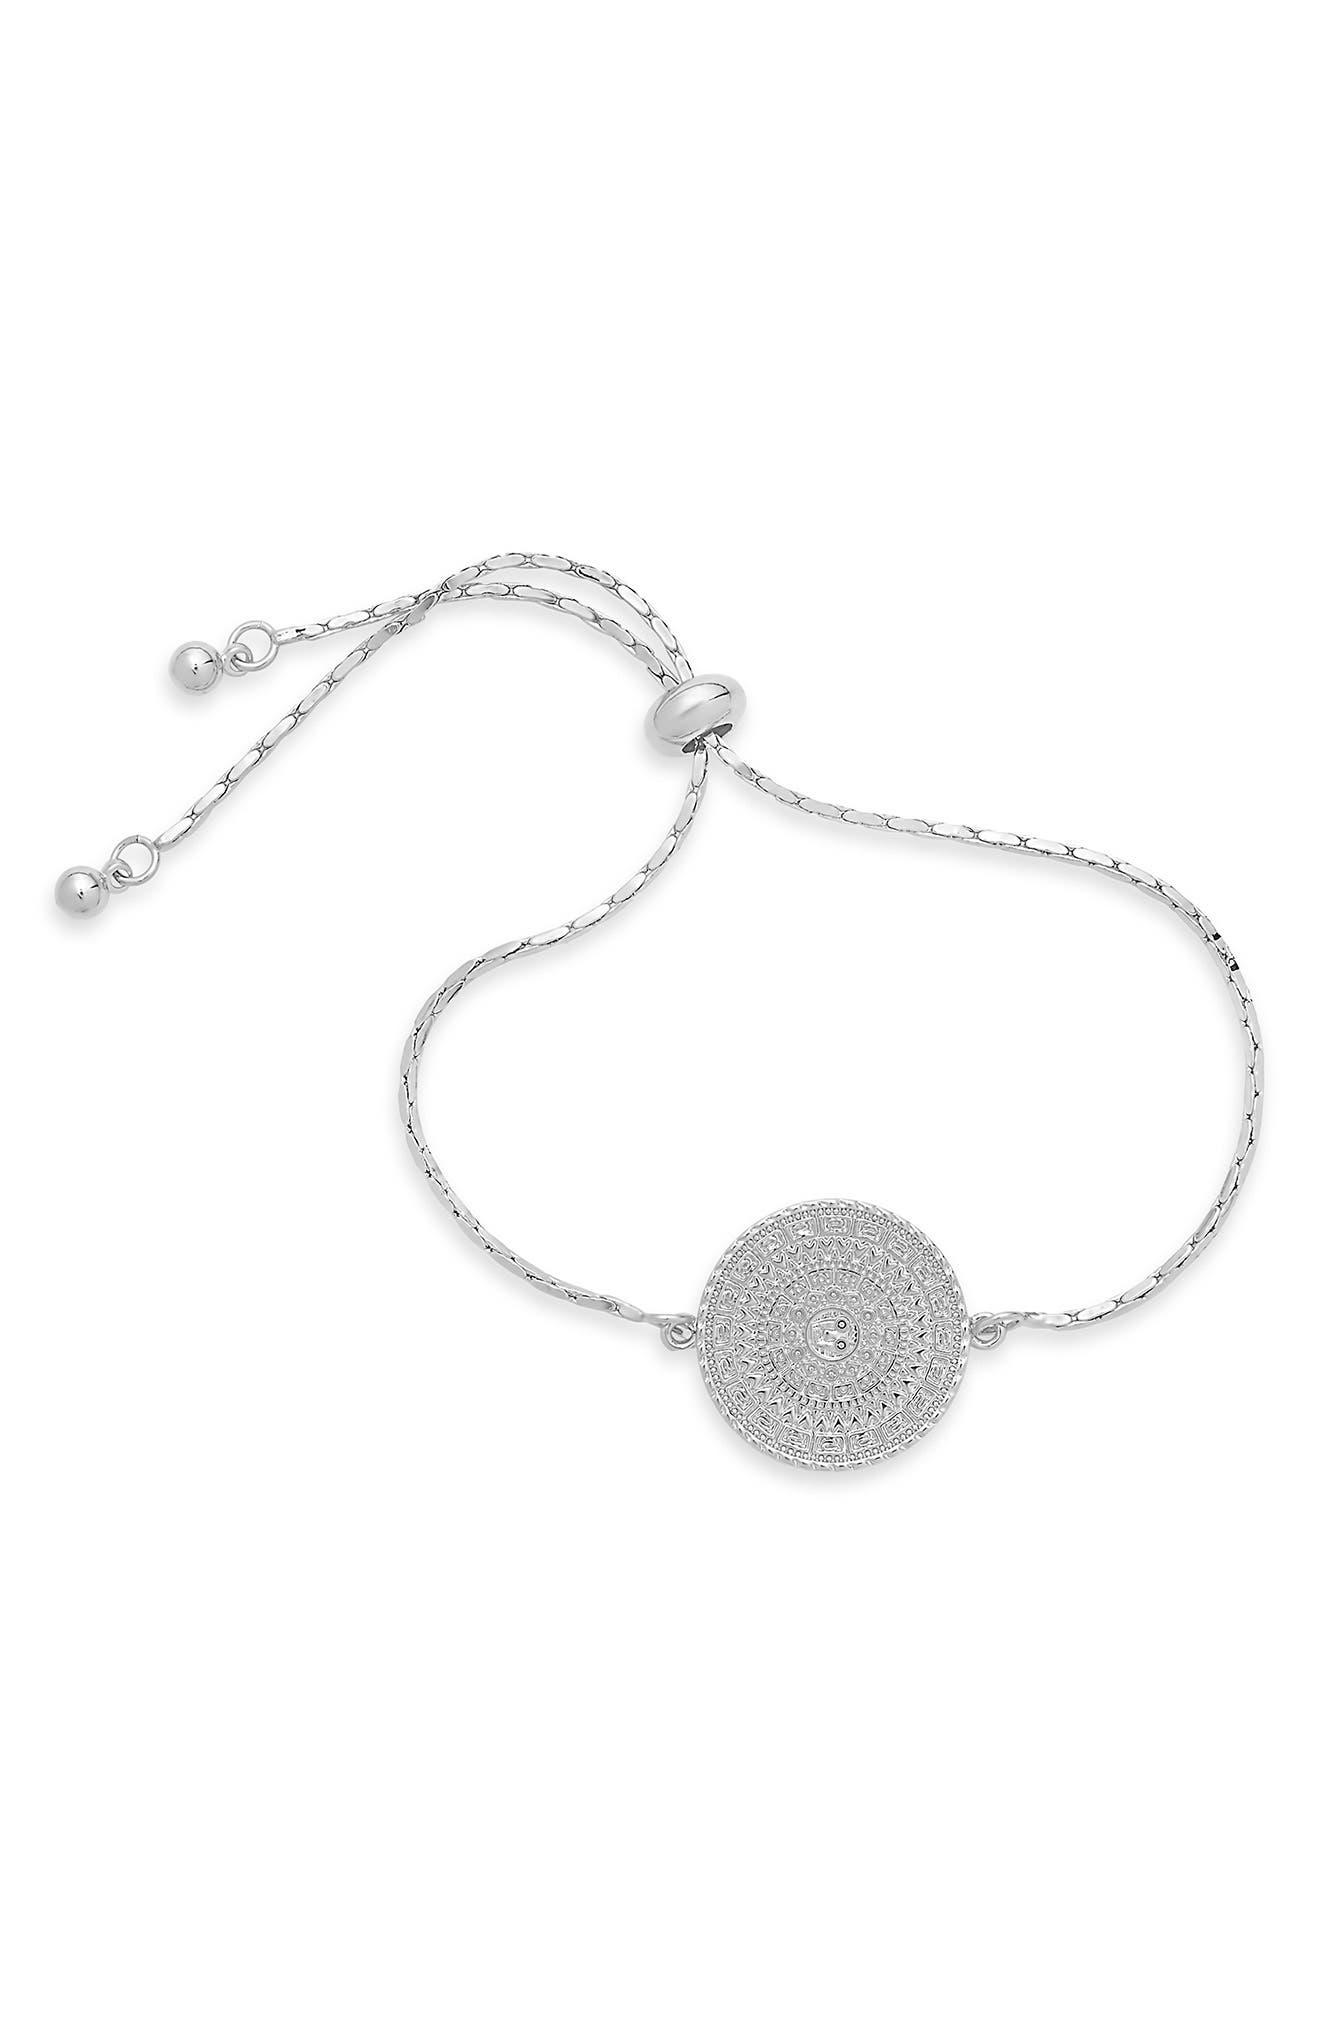 Detailed designs gleam on the medallion pendant of this adjustable and versatile bracelet. Style Name: Sterling Forever Medallion Slider Bracelet. Style Number: 5868276. Available in stores.